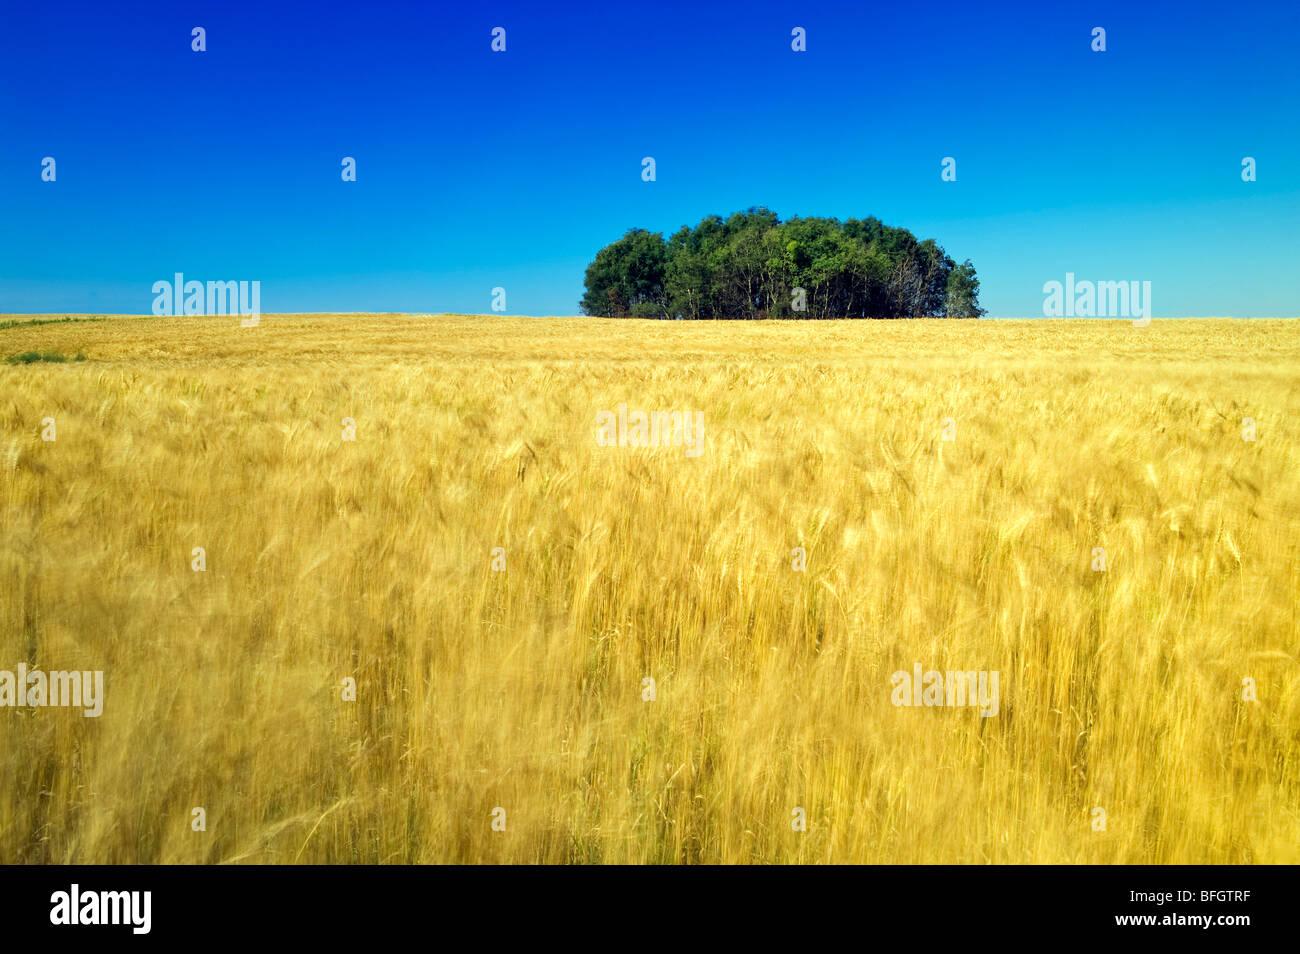 Campo de grano. Manor, Saskatchewan, Canadá Imagen De Stock